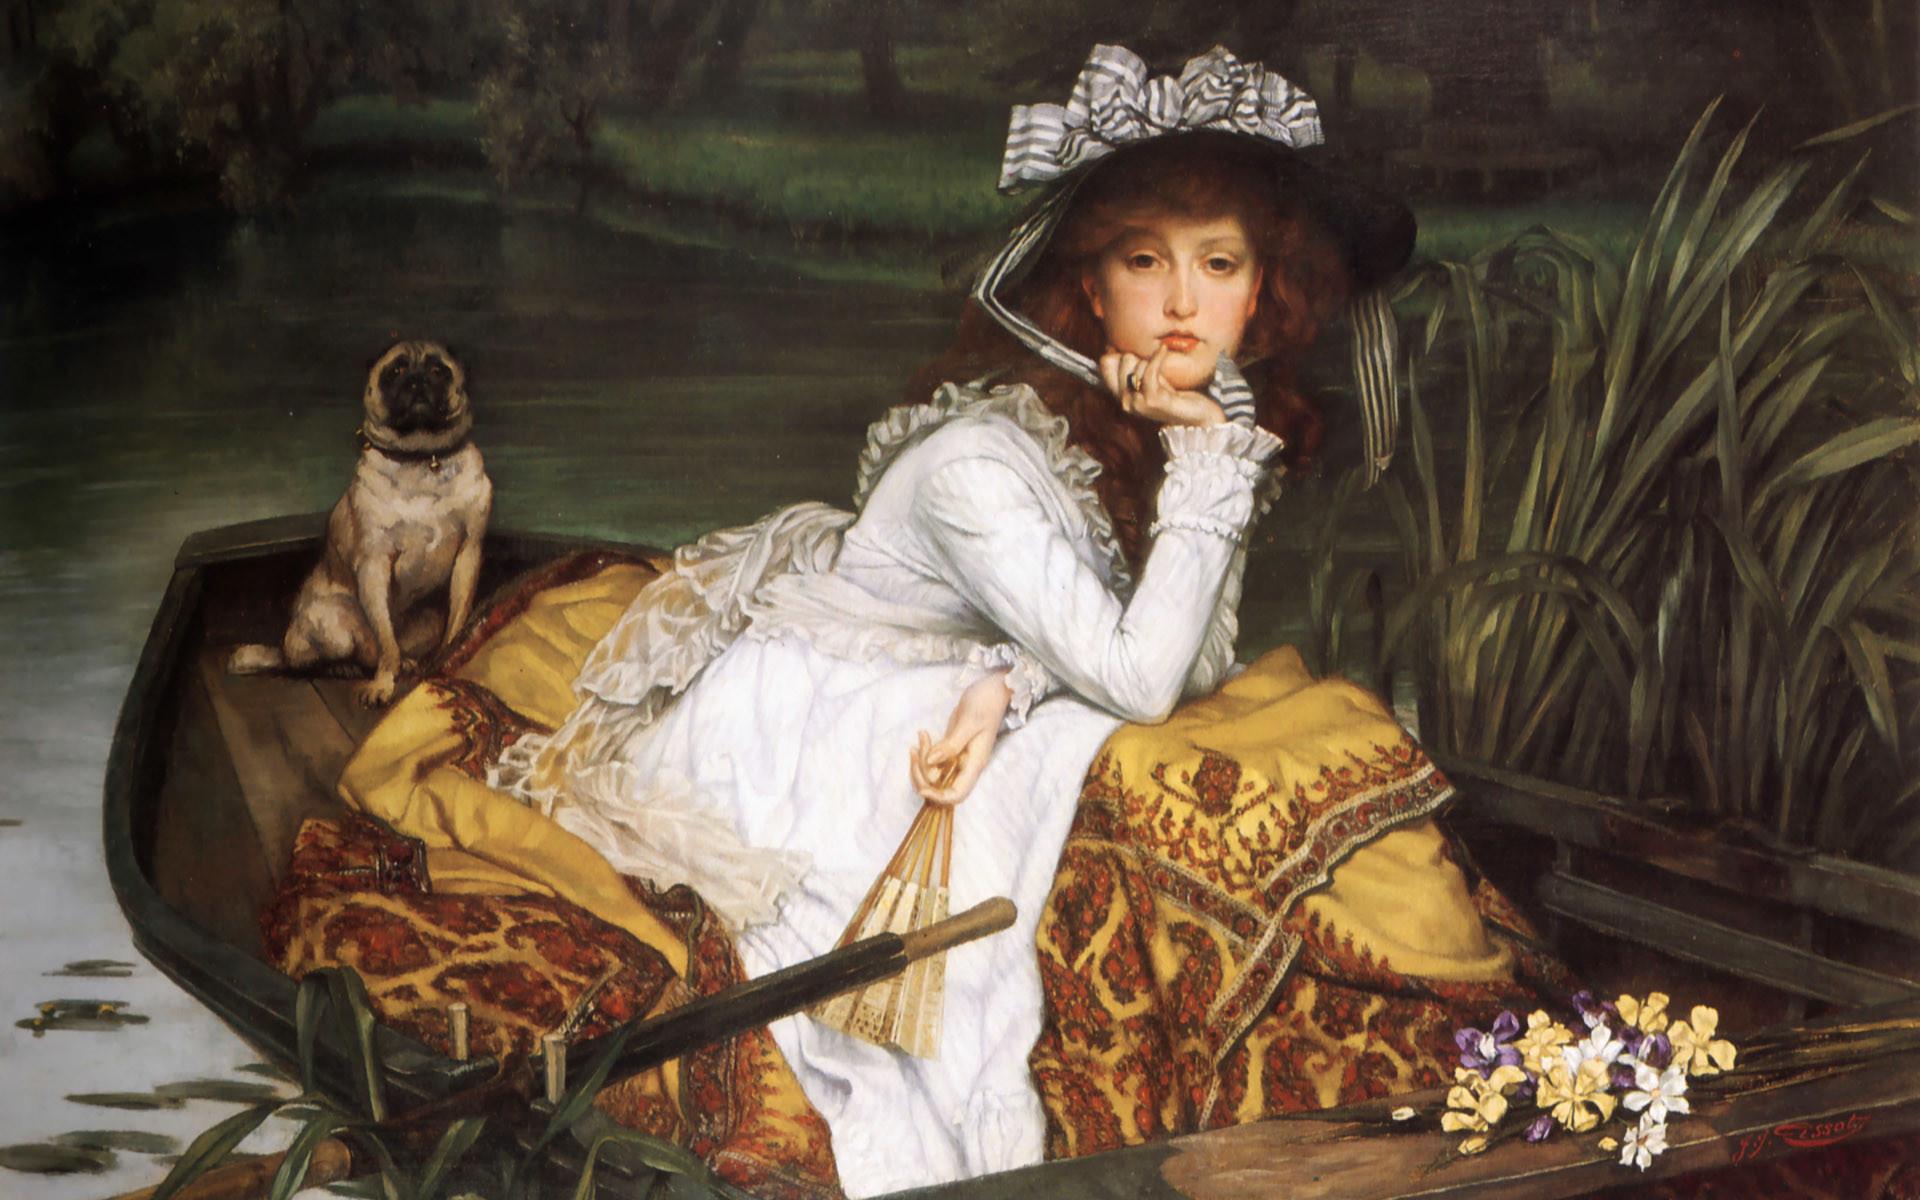 Wallpapers, Fine Art, World Famous Paintings Desktop Wallpapers .